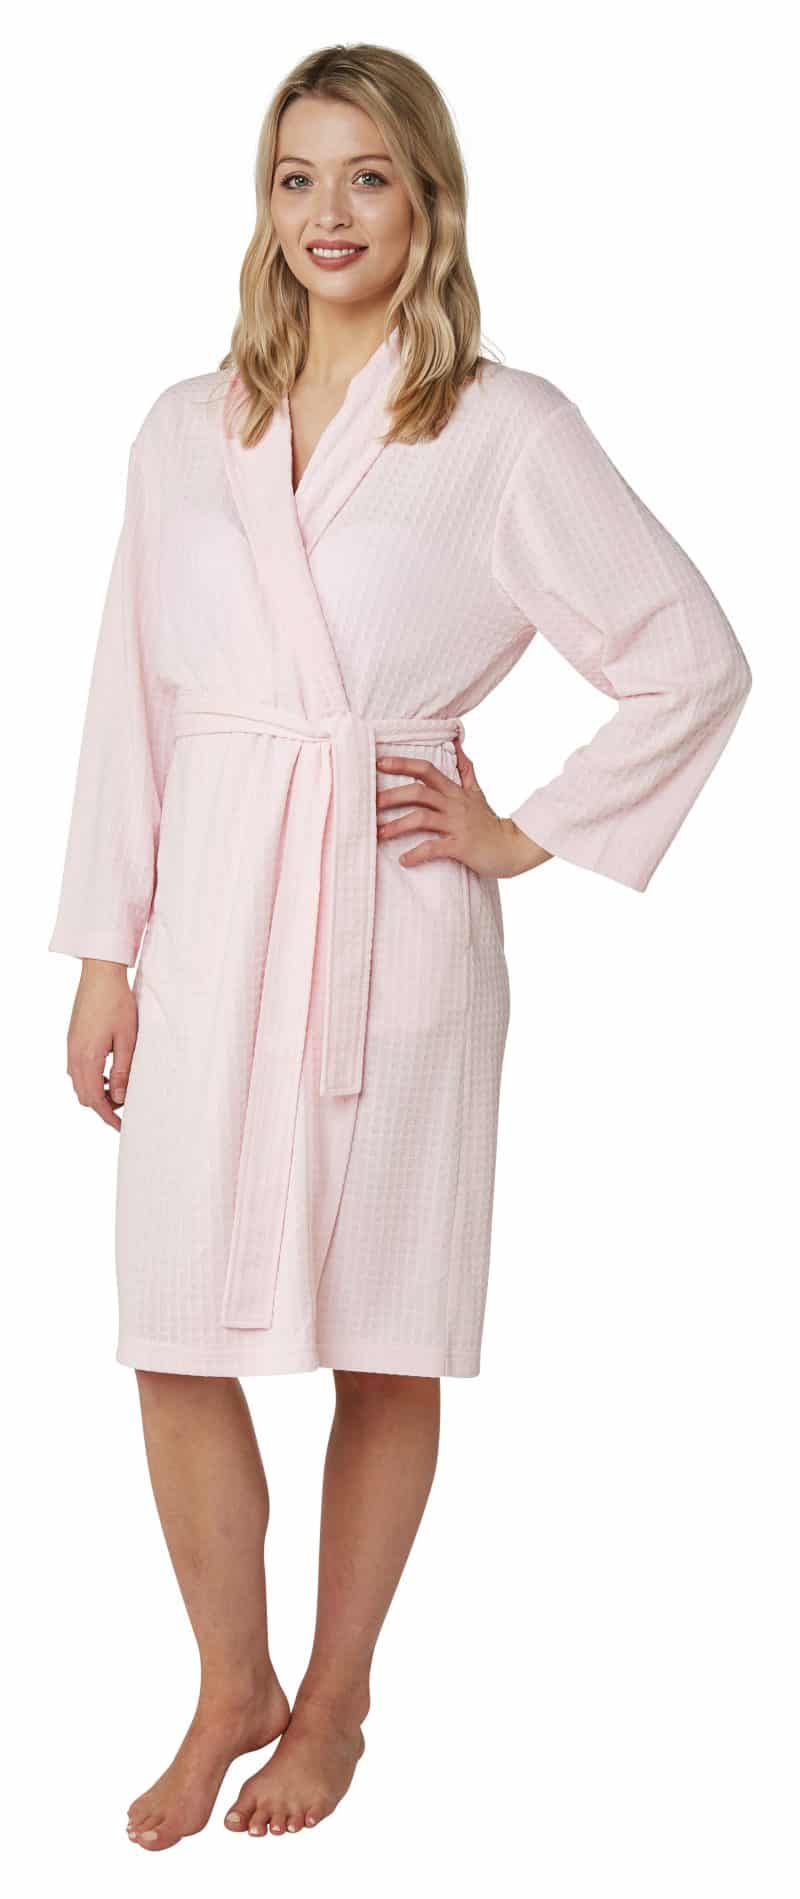 Waffle Print Dressing Gown Indigo Sky In23065